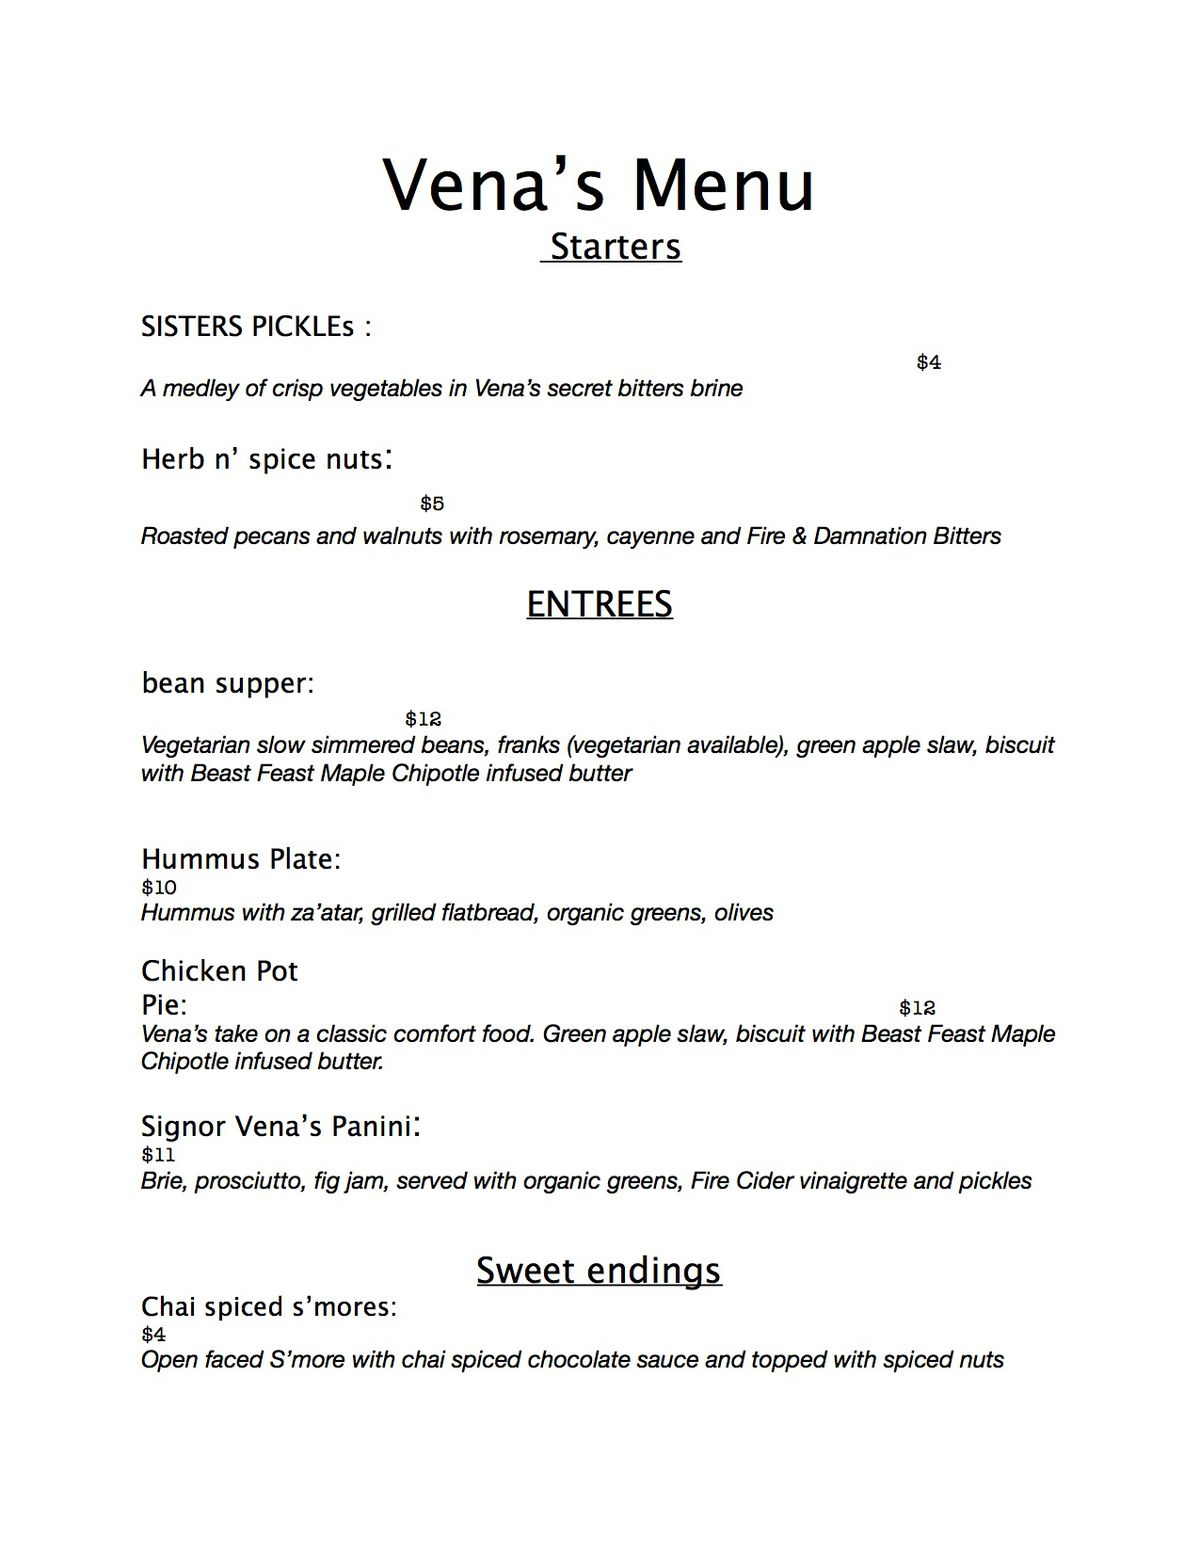 vena's food menu